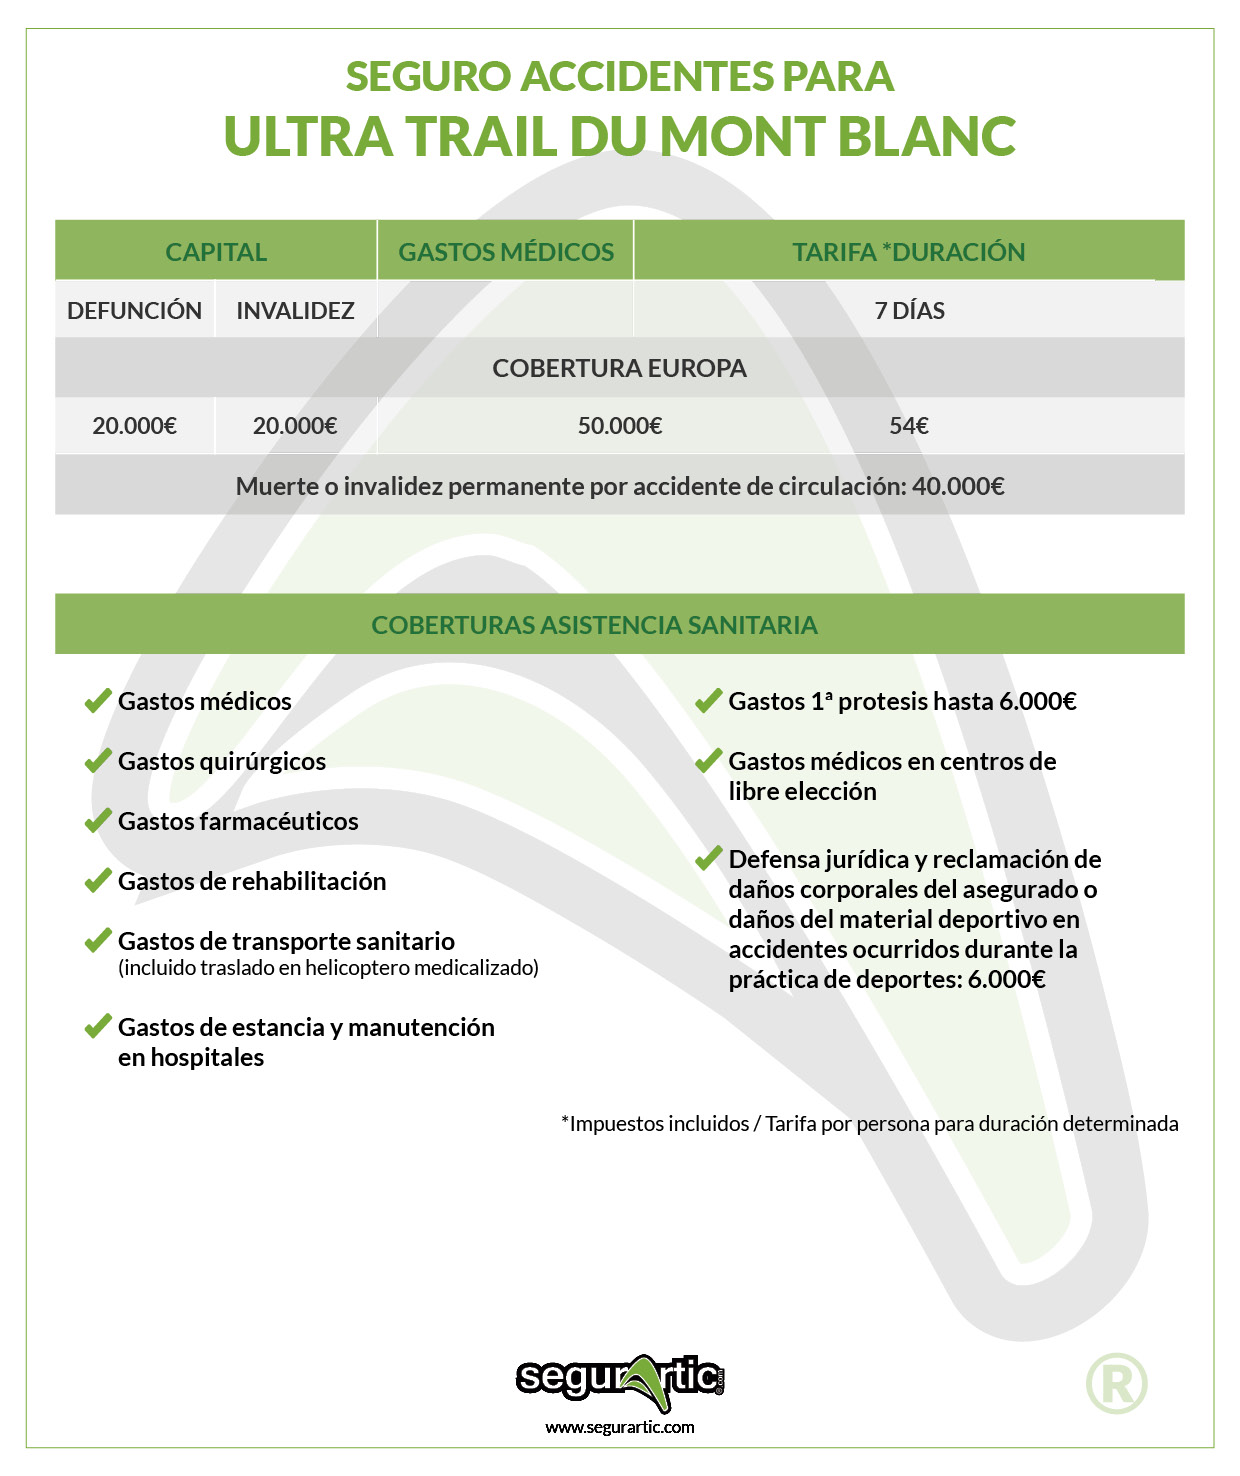 seguro-accidentes-ultra-trail-montblanc-segurartic